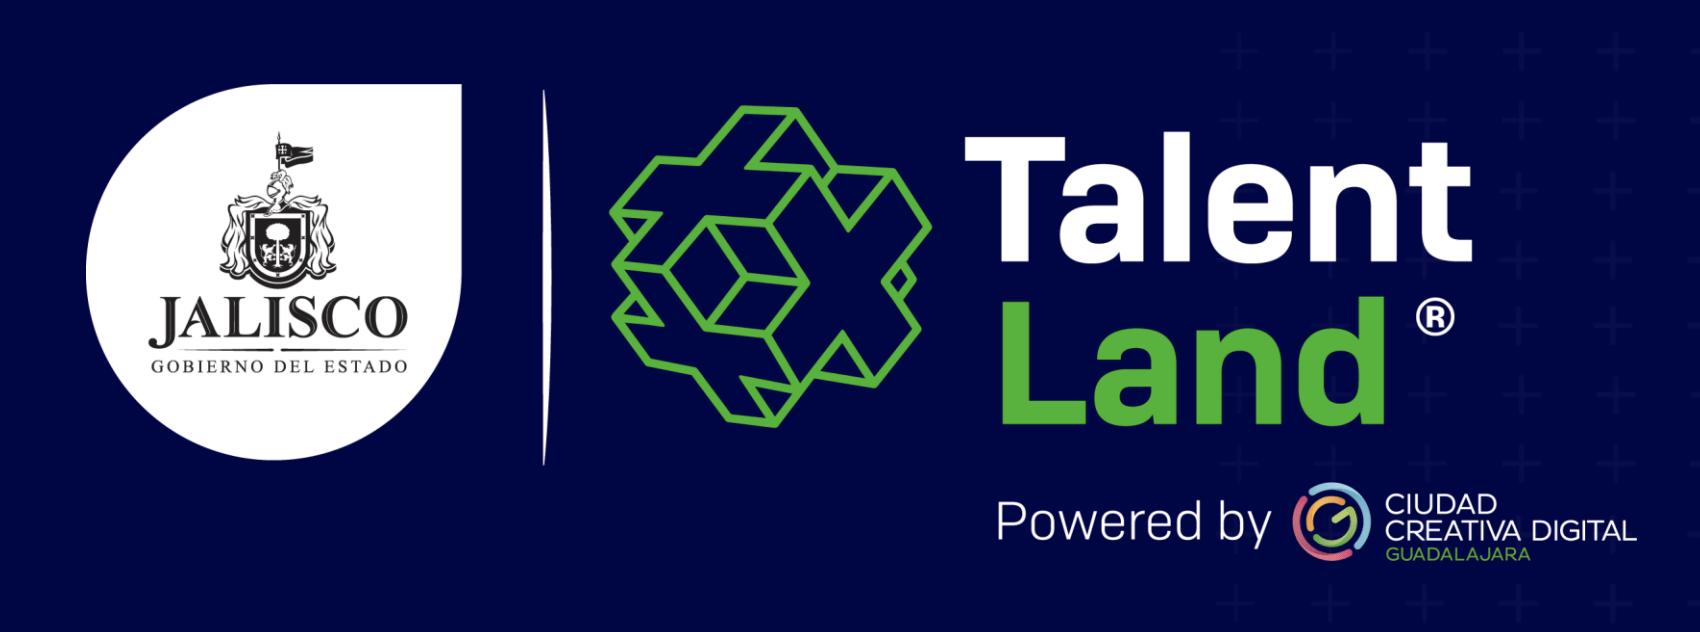 Jalisco #TalentLand 2019: Día 2 1